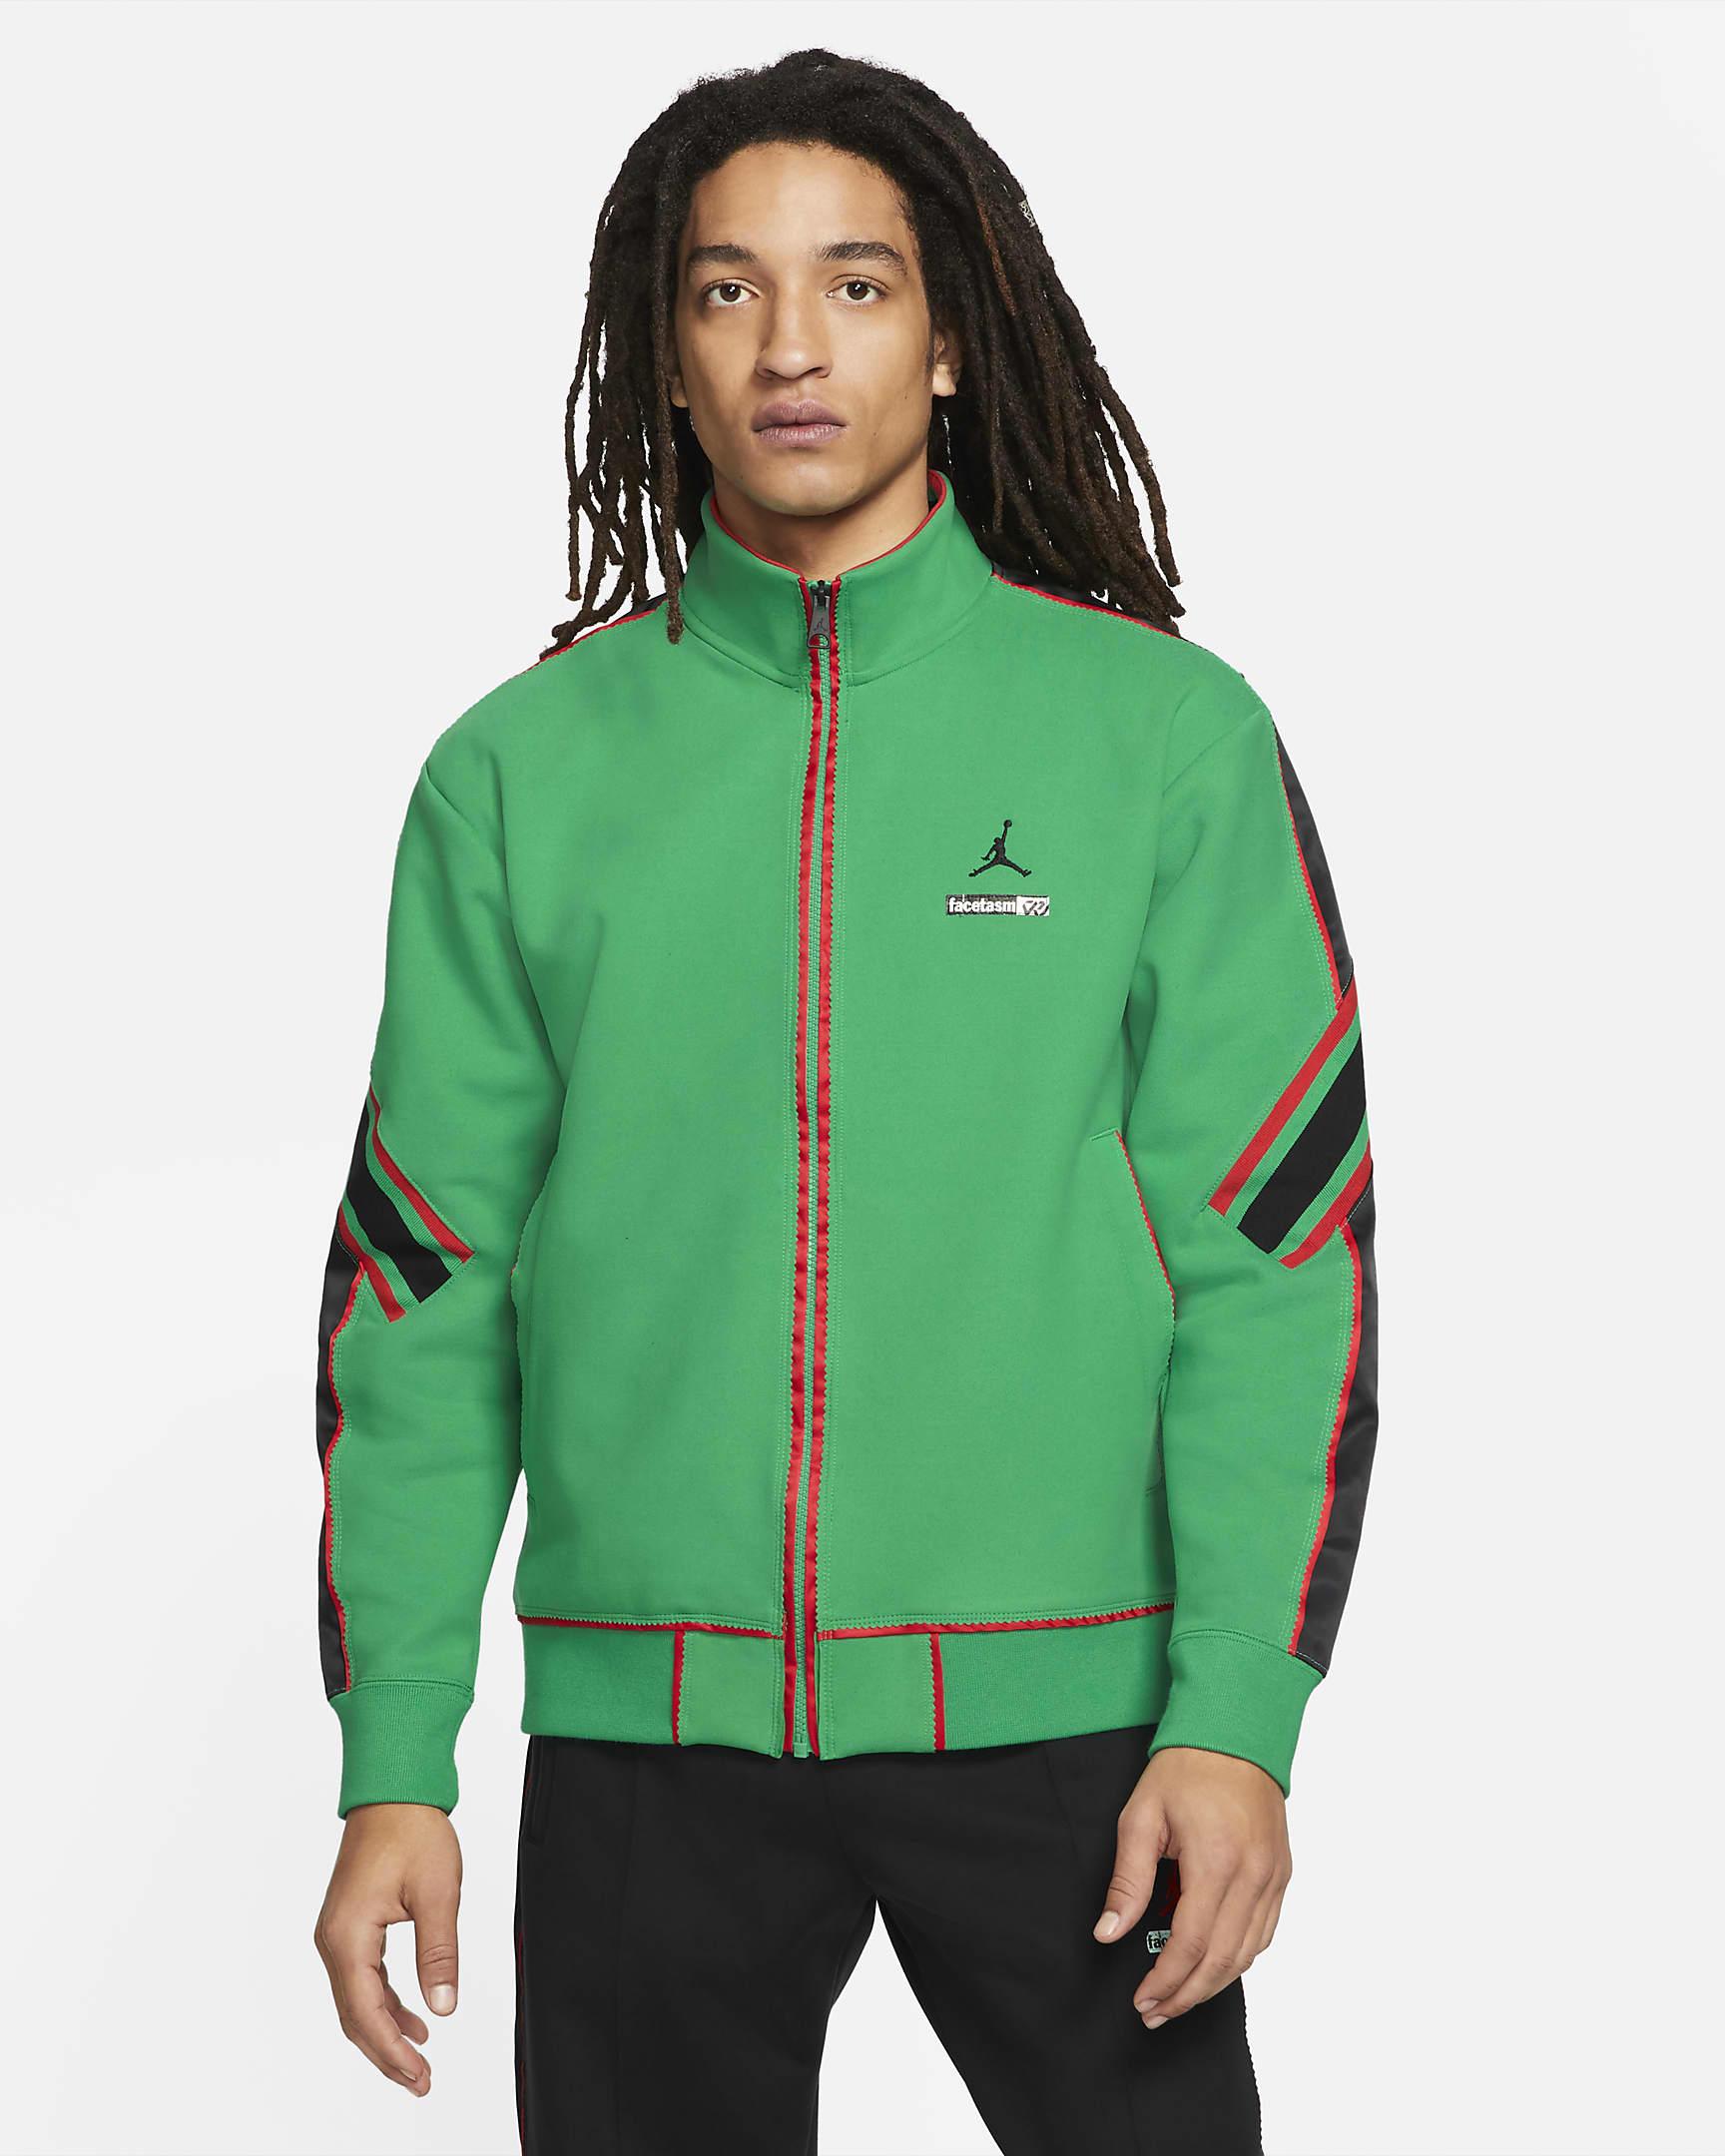 jordan-why-not-x-facetasm-mens-track-jacket-CmdpQ2-2